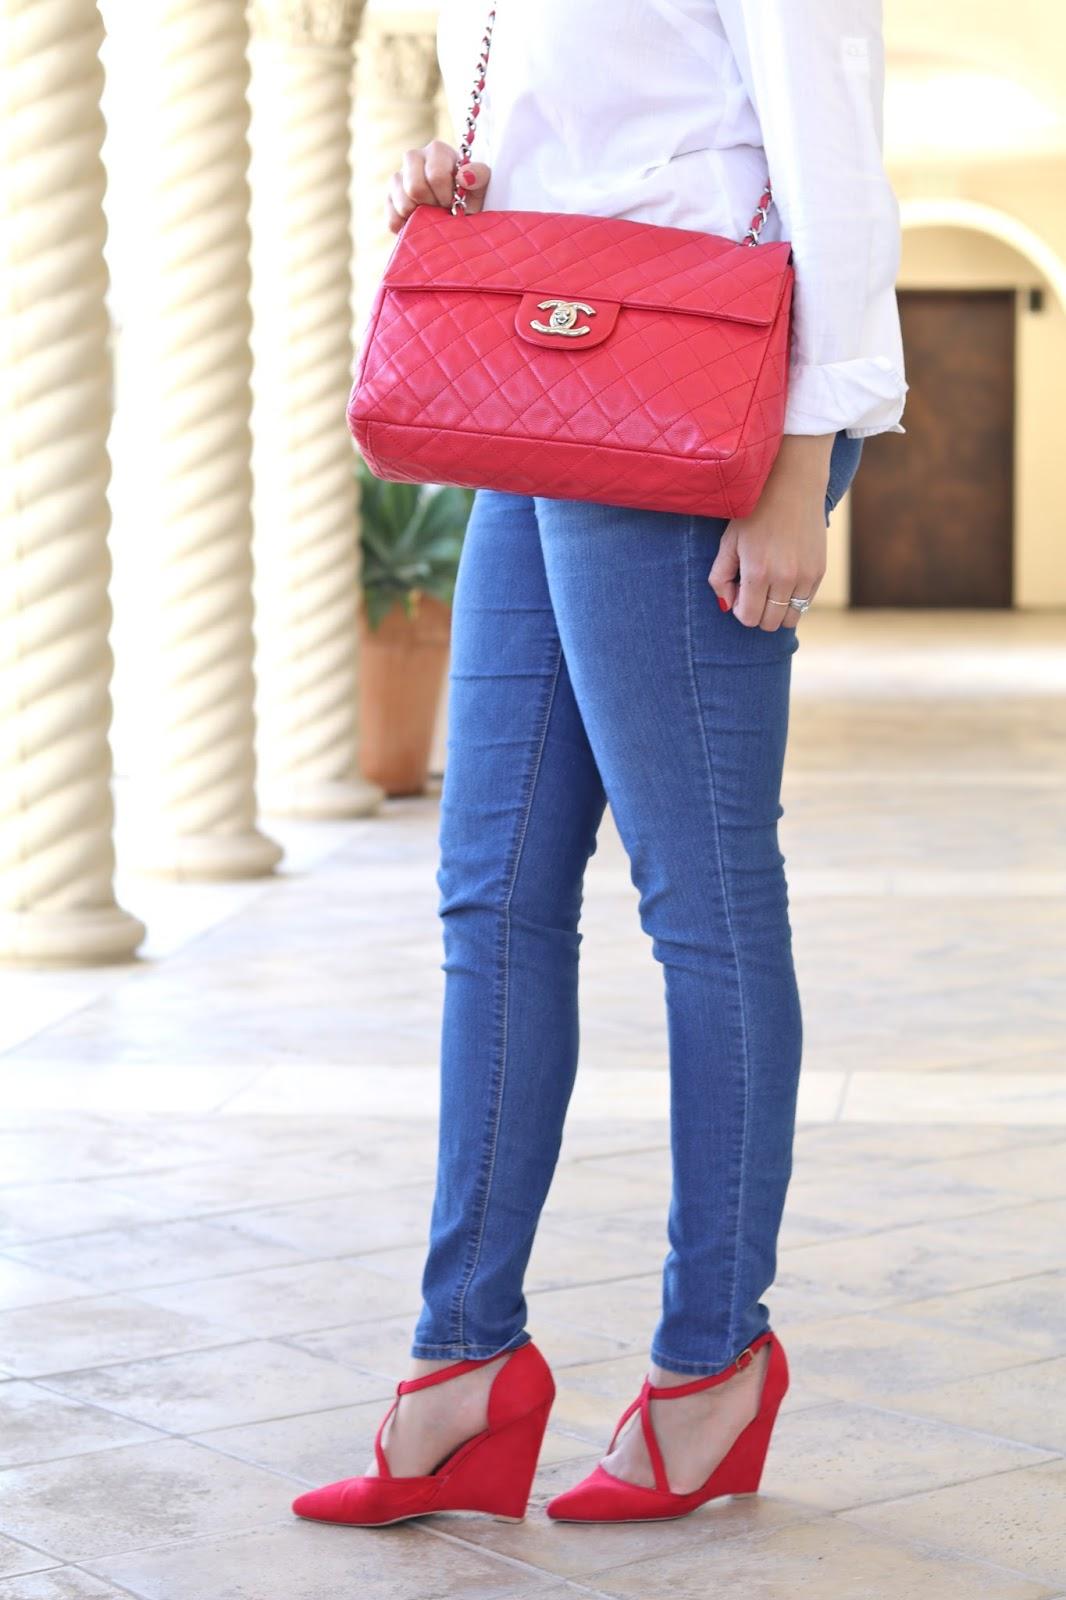 red caviar chanel, how to wear a caviar chanel bag, where to get a chanel bag, designer vault blogger